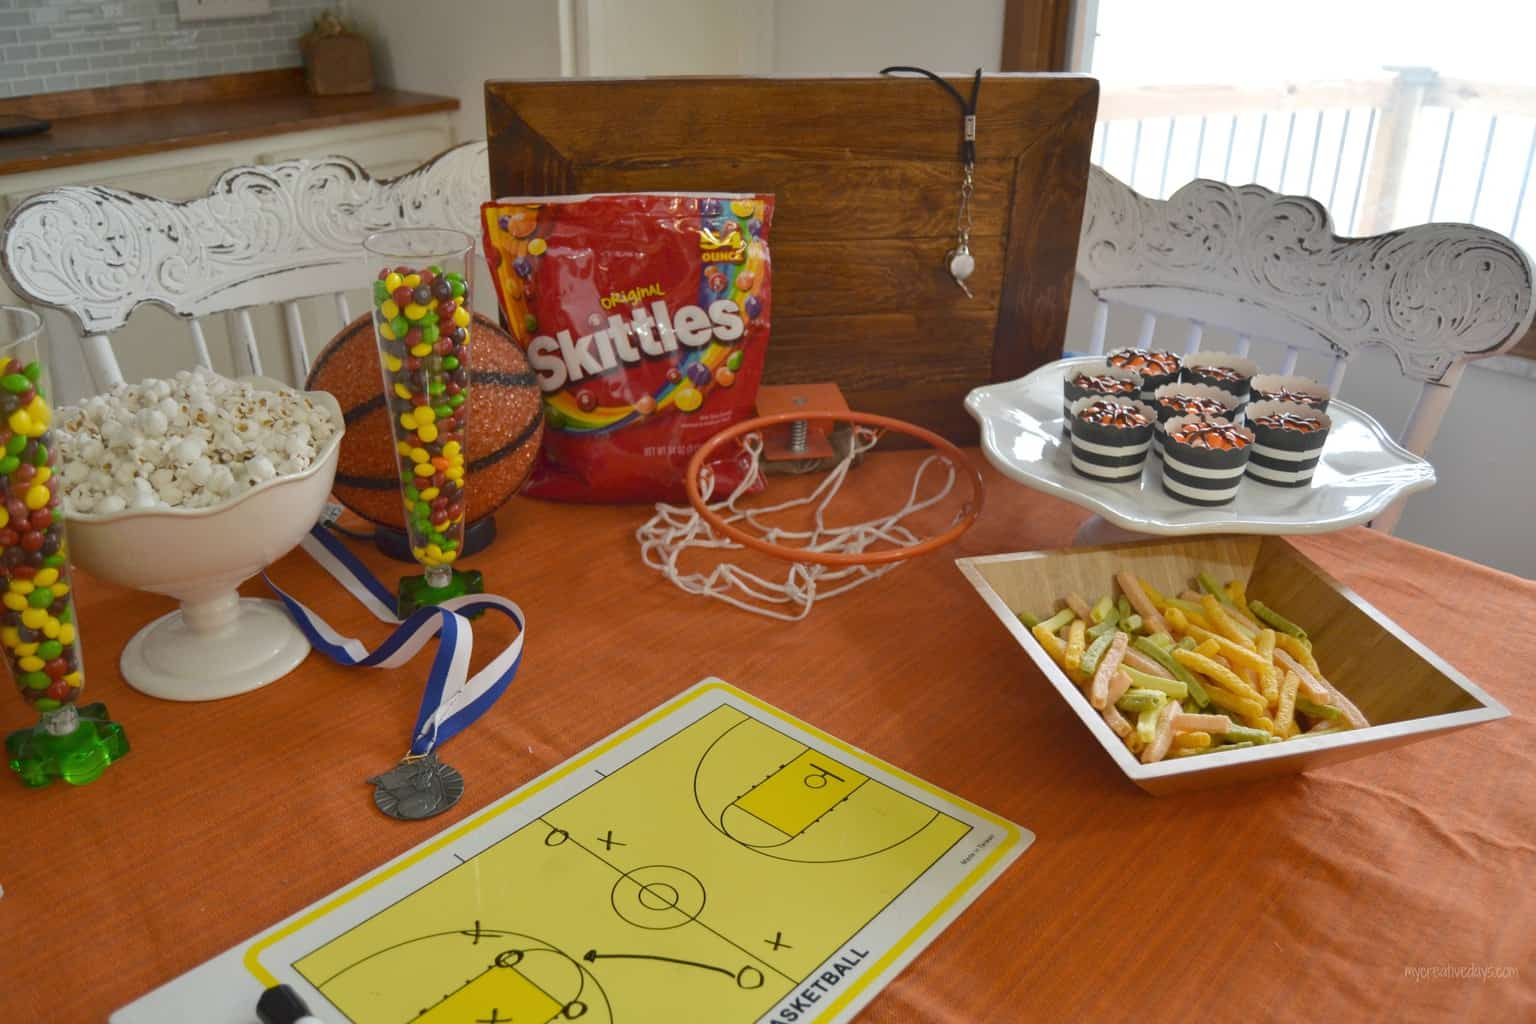 Basketball Party With Skittles mycreativedays.com